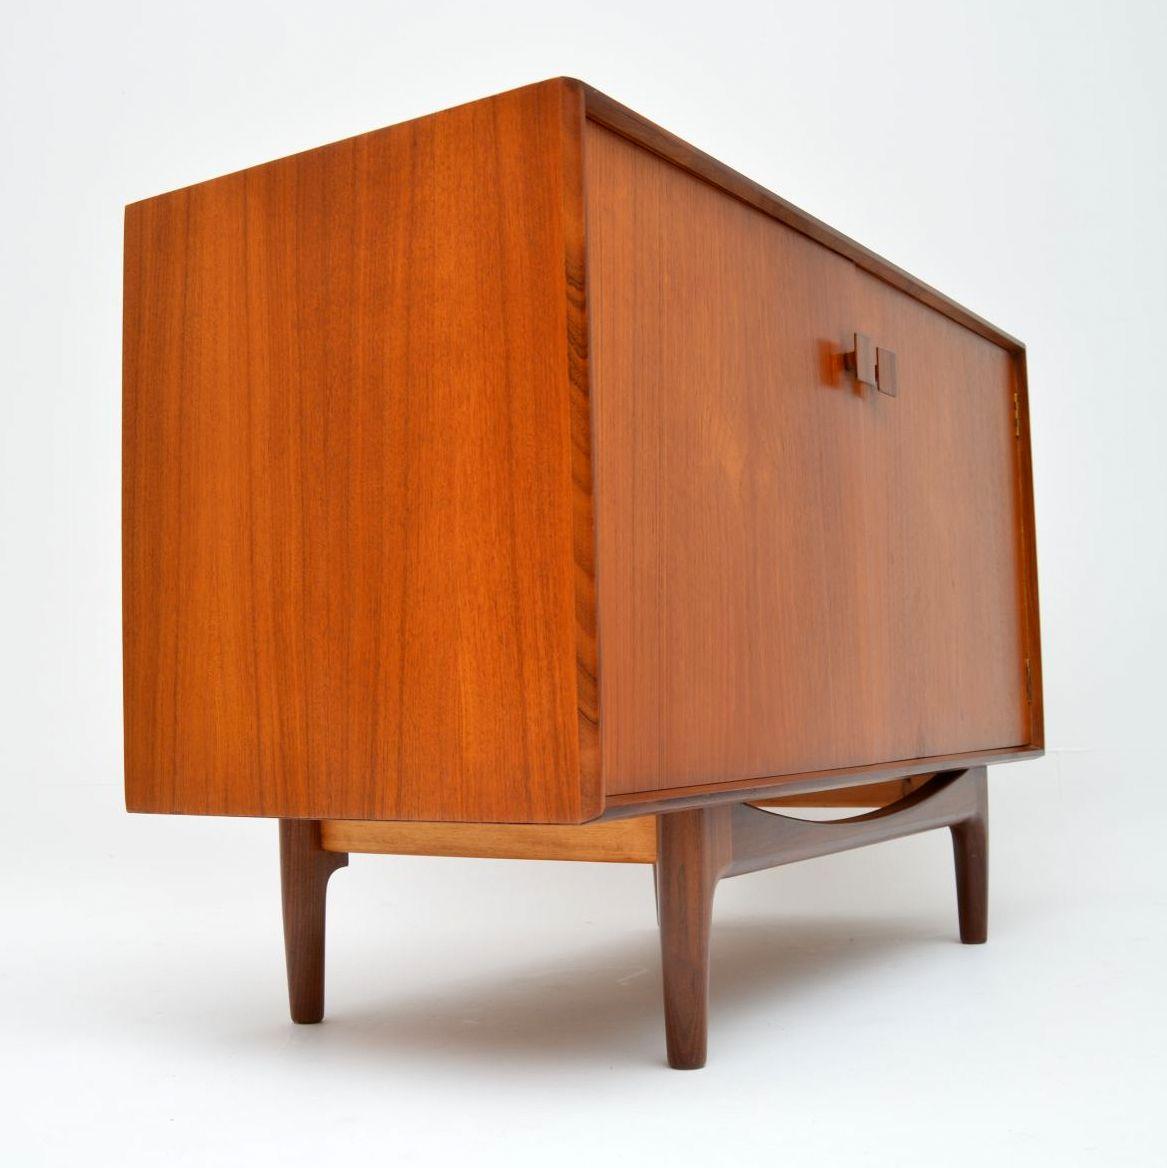 danish_teak_sideboard_cabinet_kofod_larsen_5